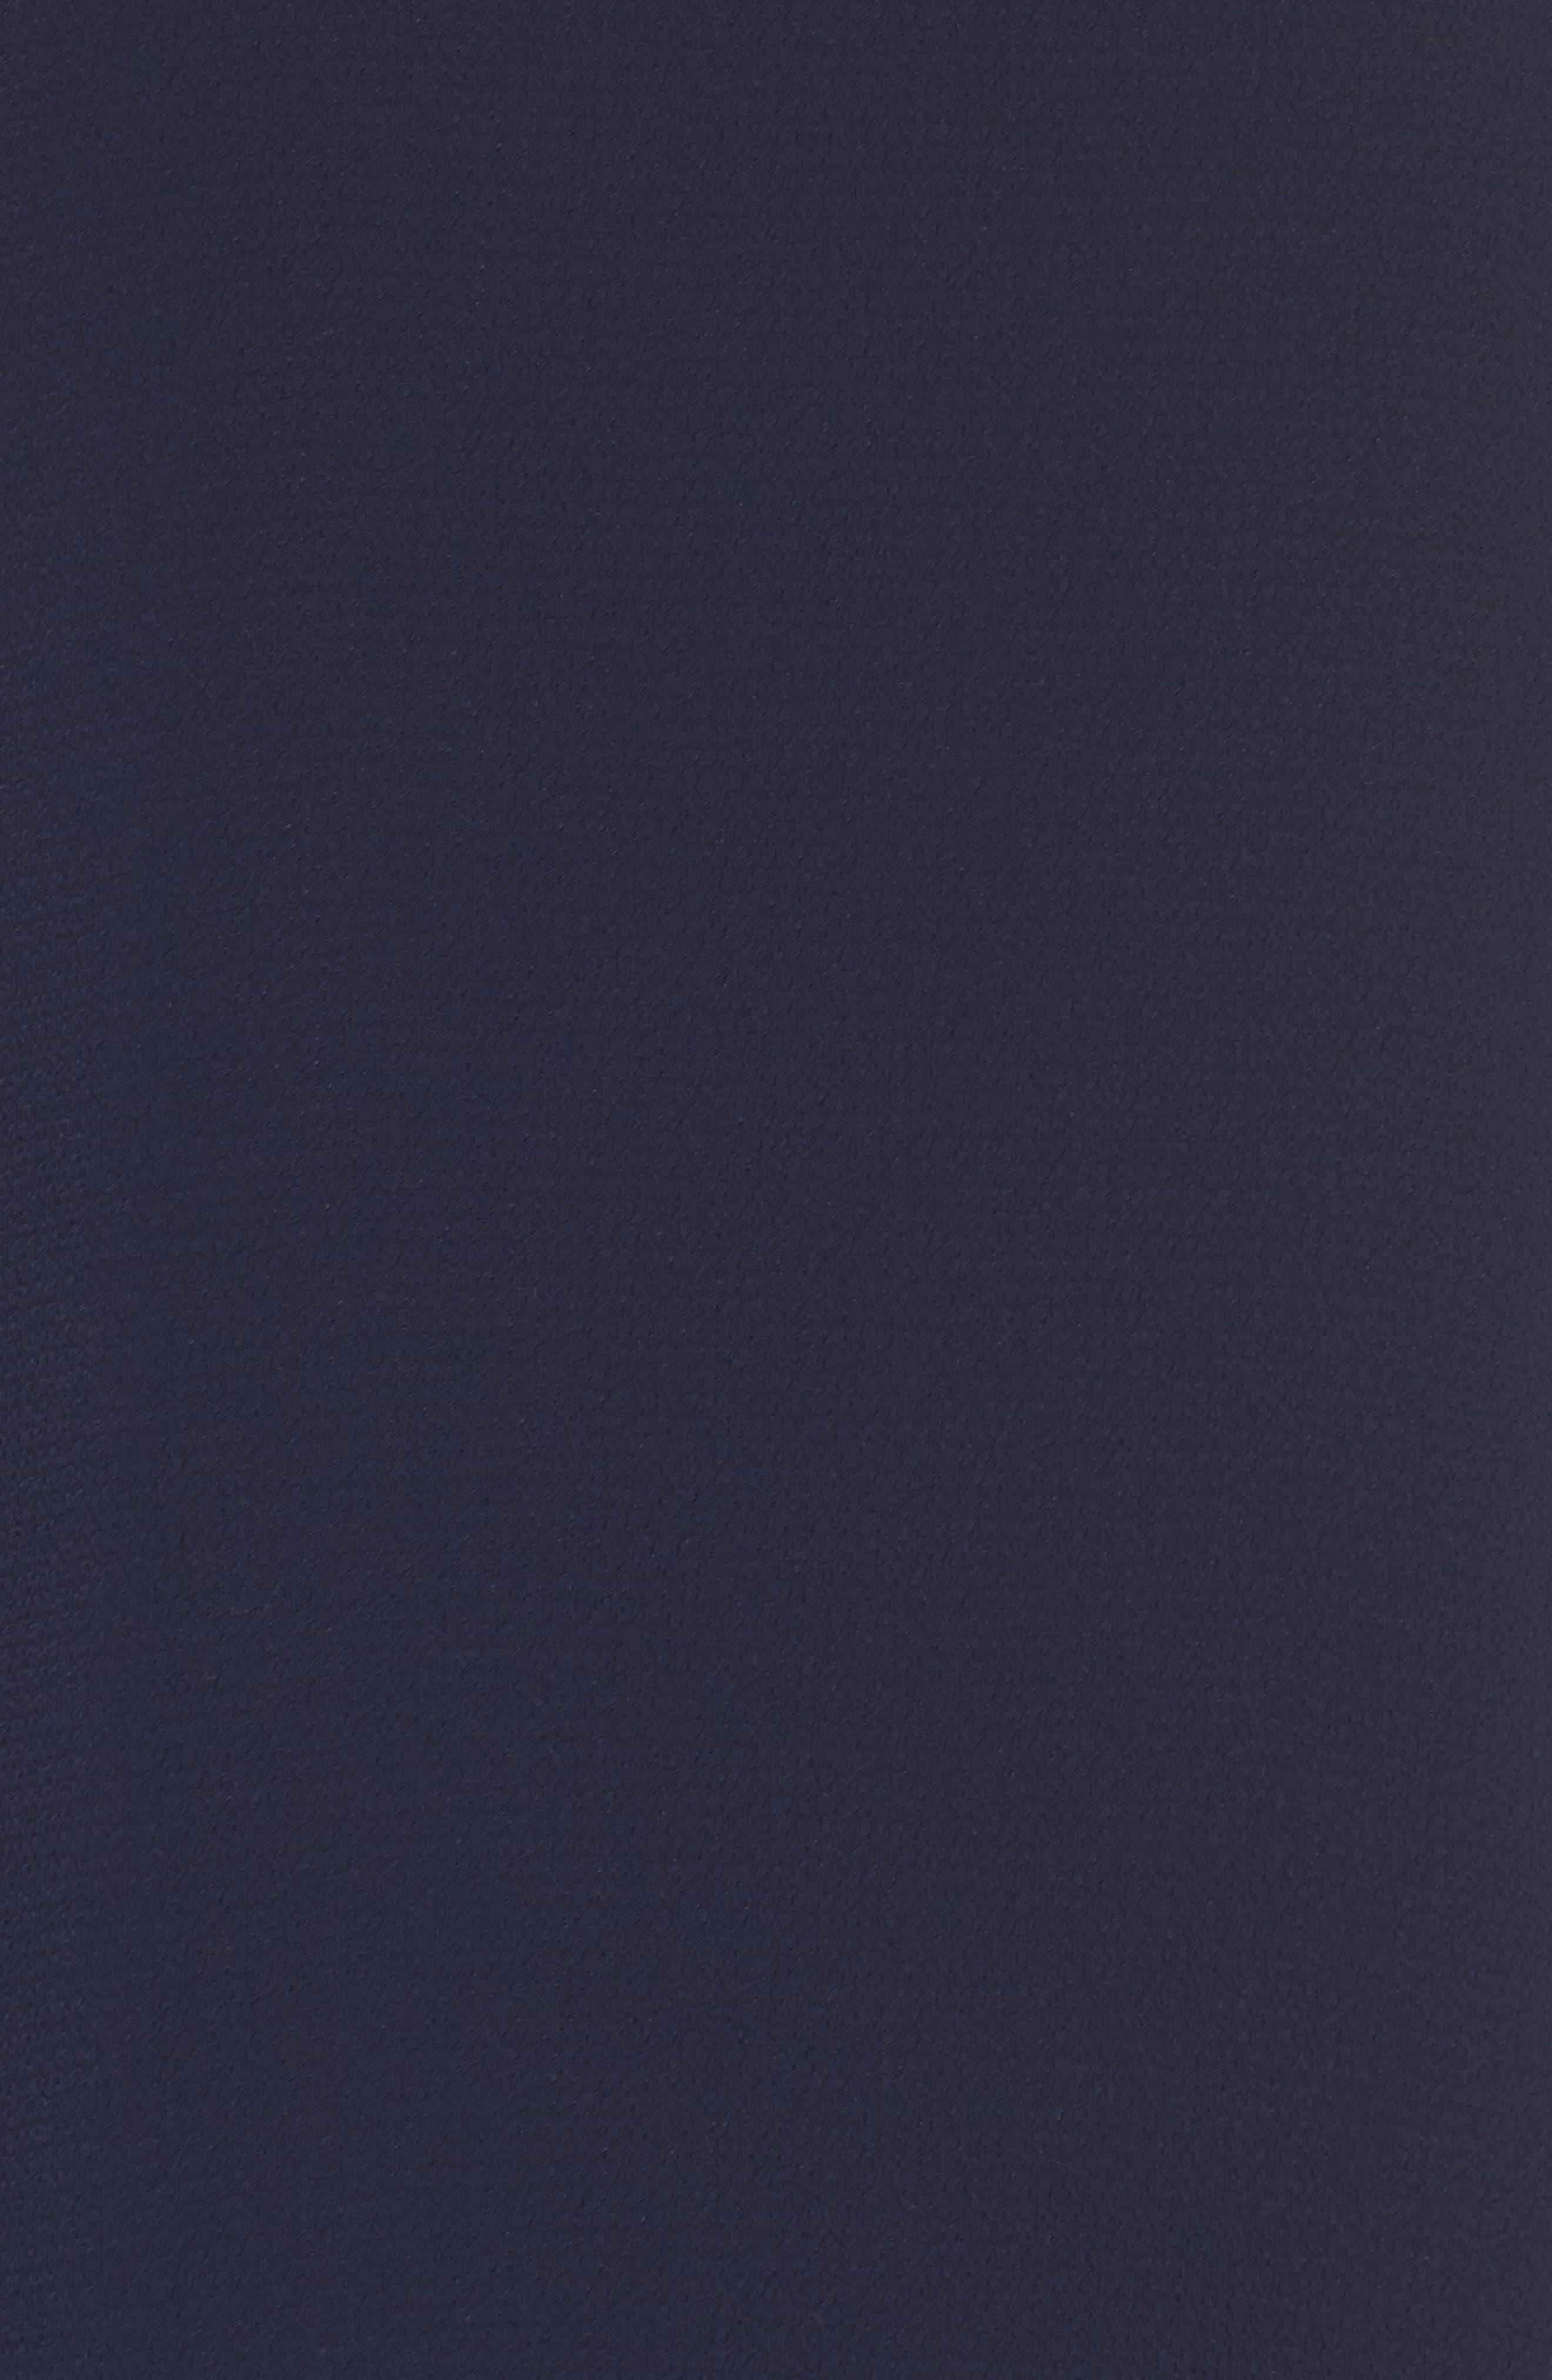 Cold Shoulder Shift Dress,                             Alternate thumbnail 6, color,                             Galaxy Blue